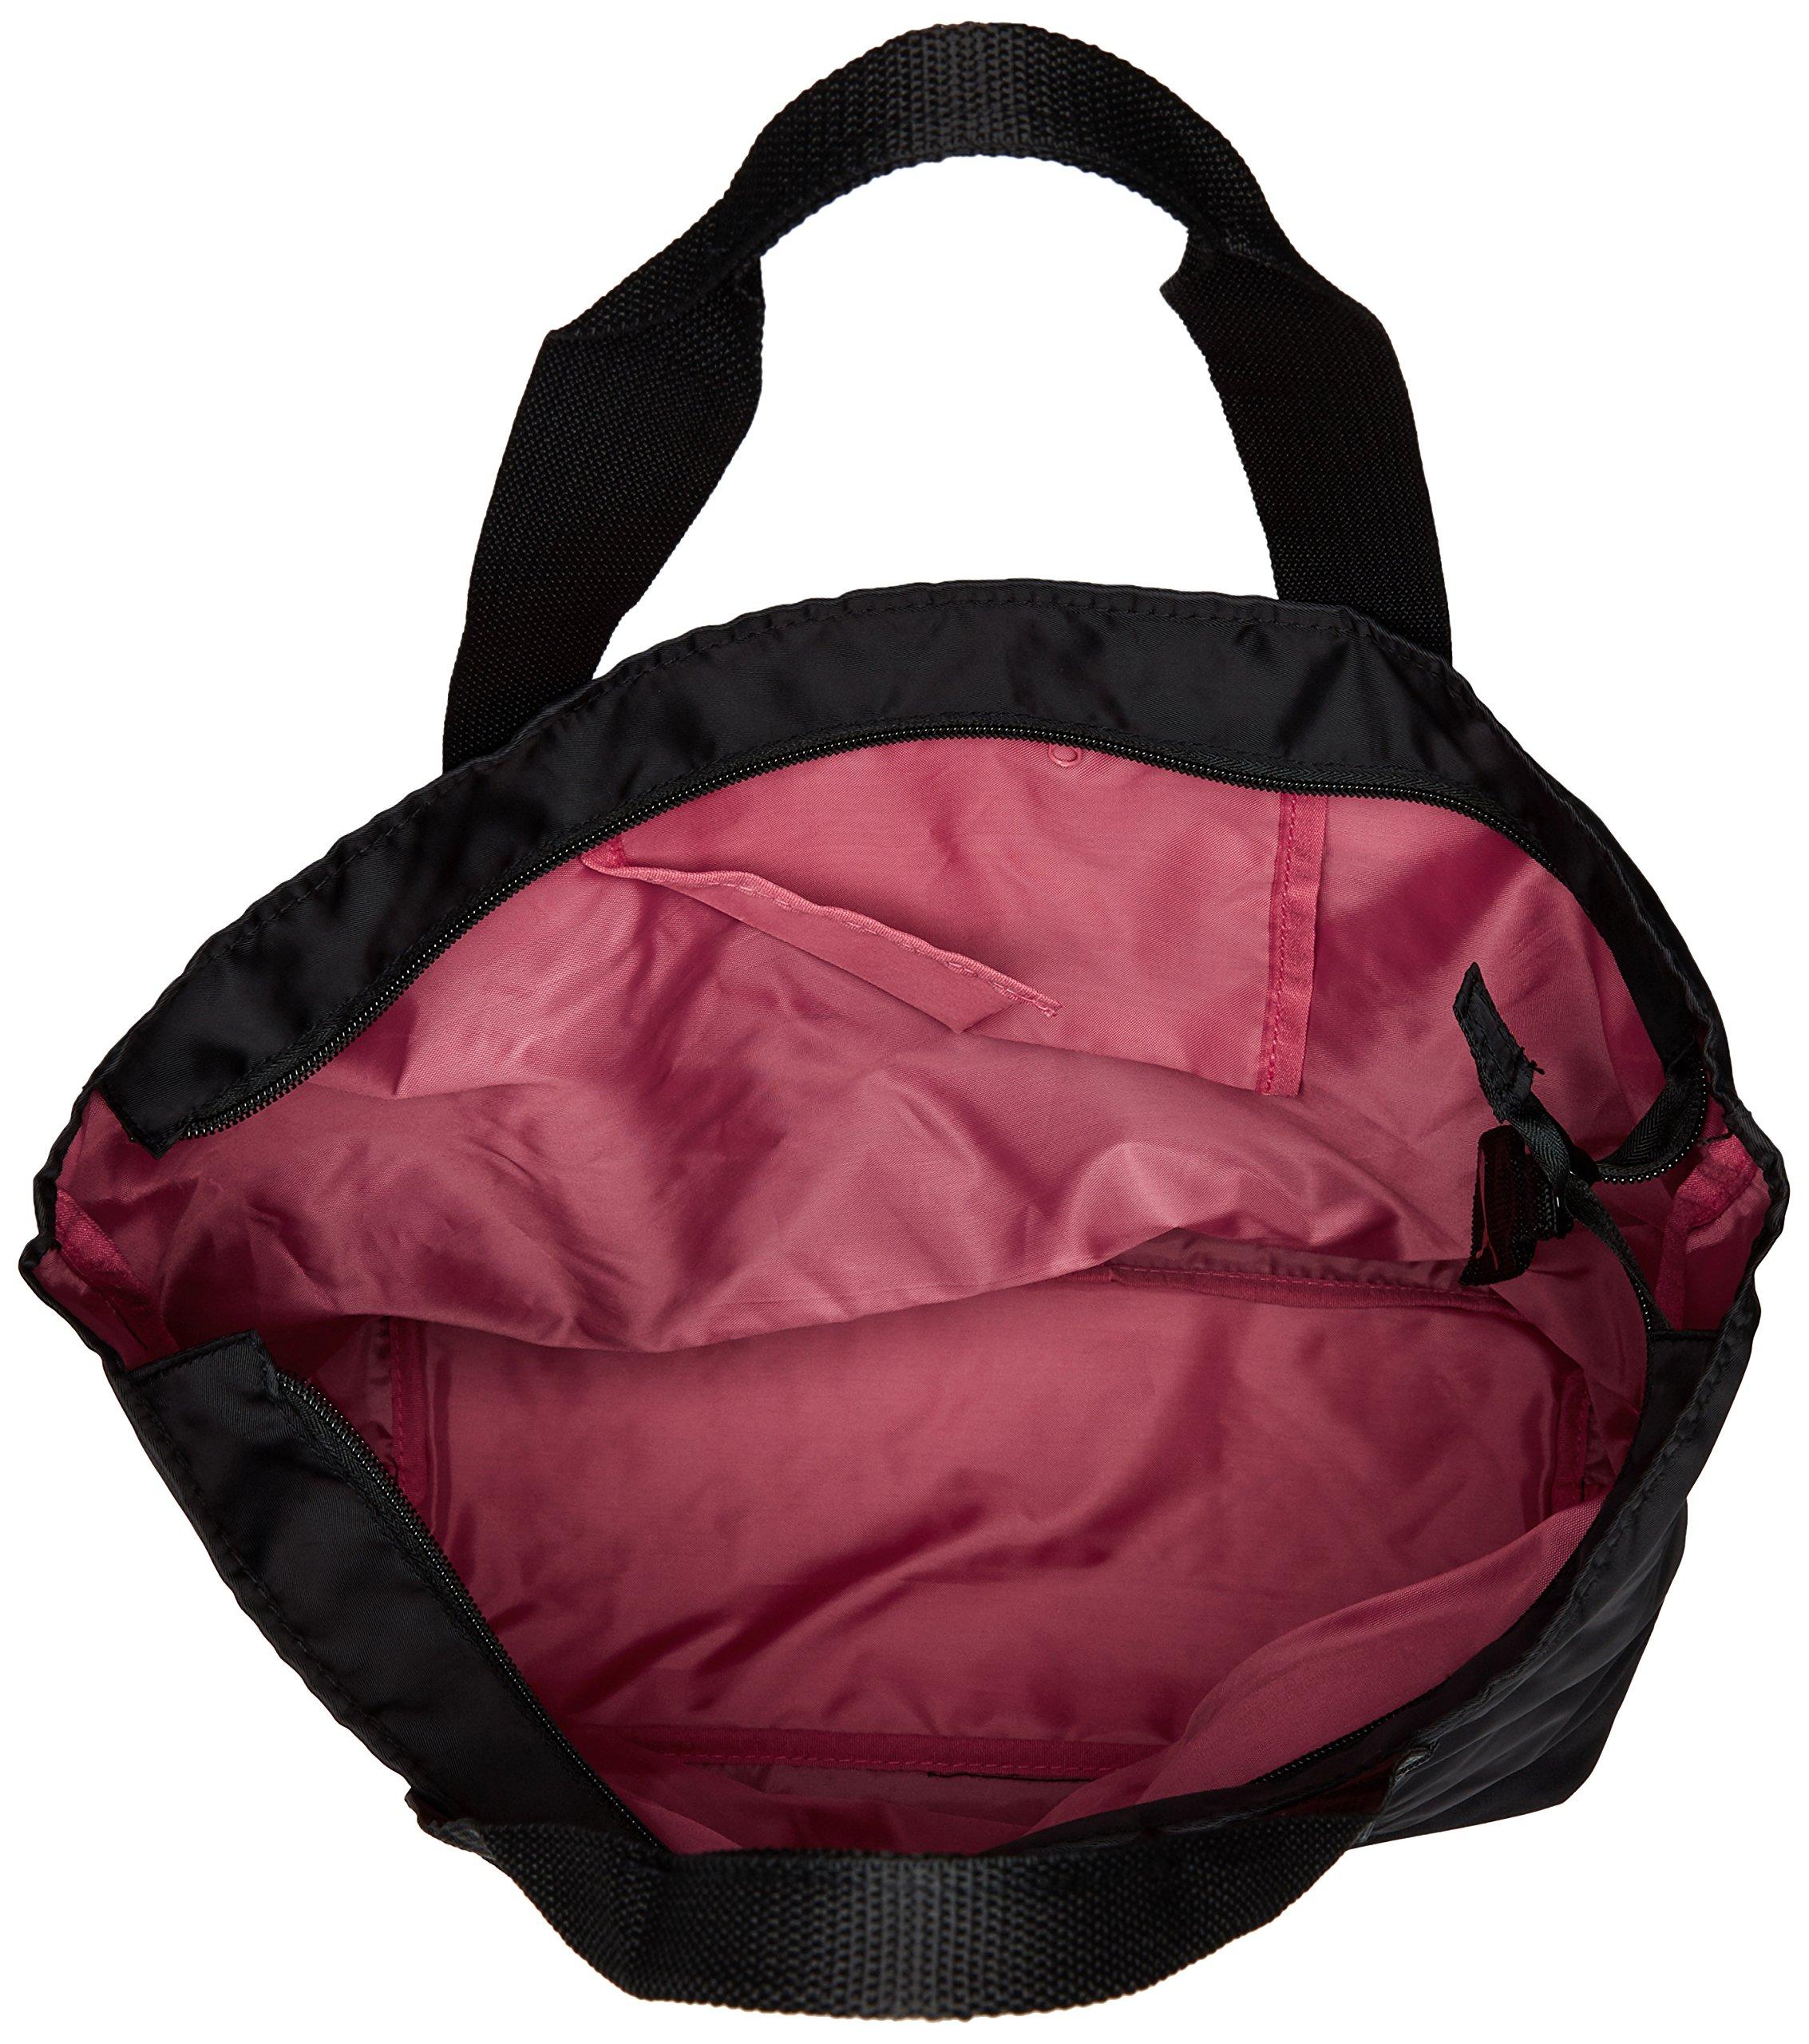 e8b598a0cc3d puma women s pv1679 cambridge tote bag grey grey new style 231bd ...